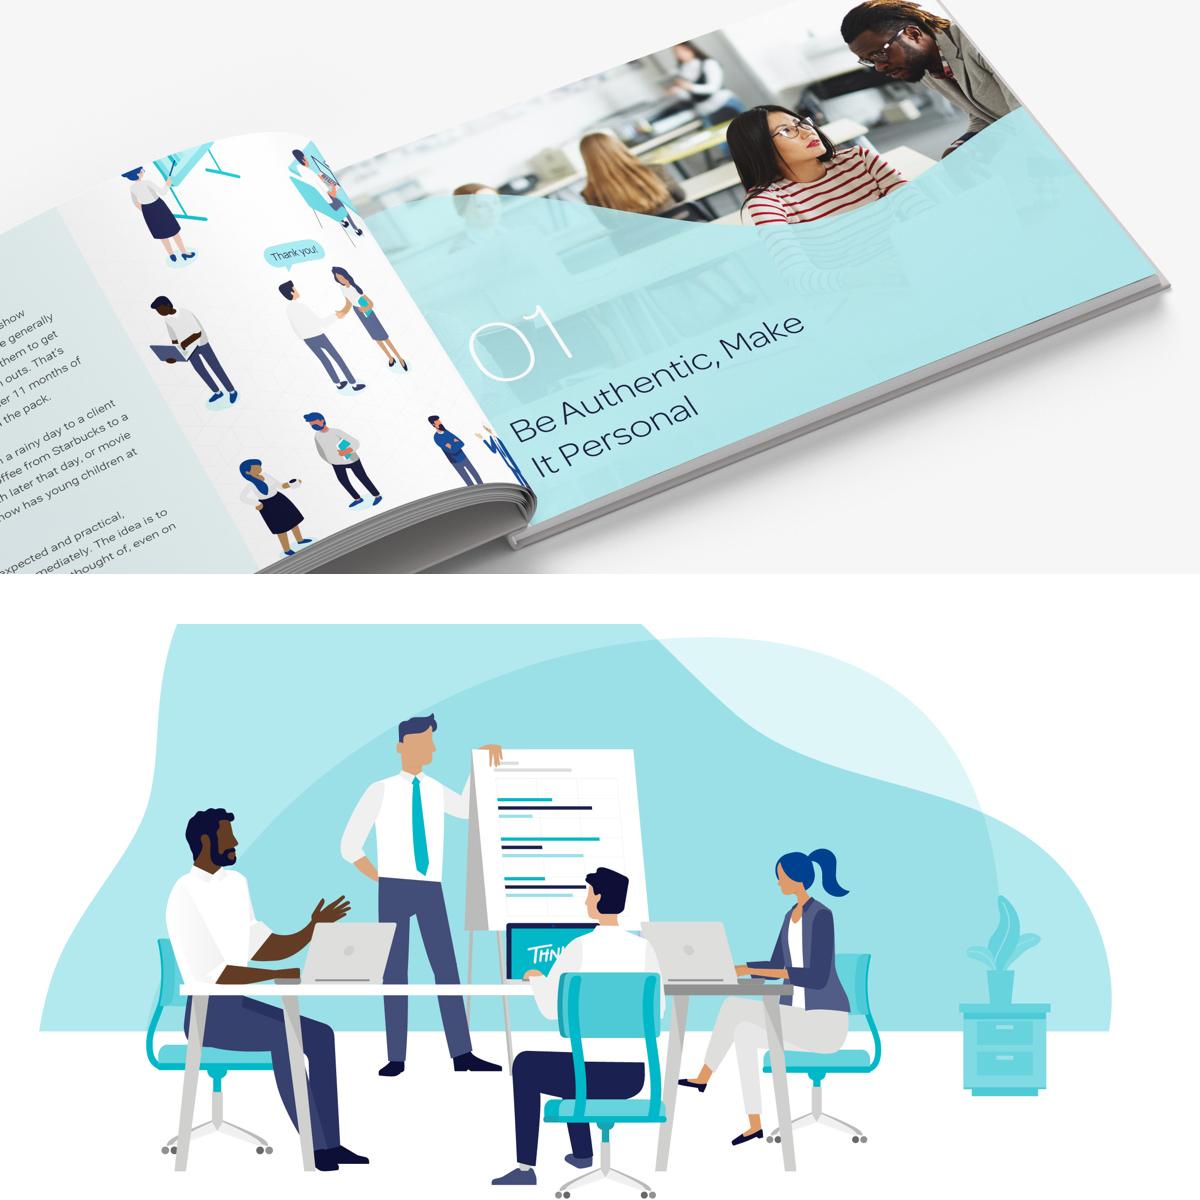 Thnks branded book design with flat illustration graphics